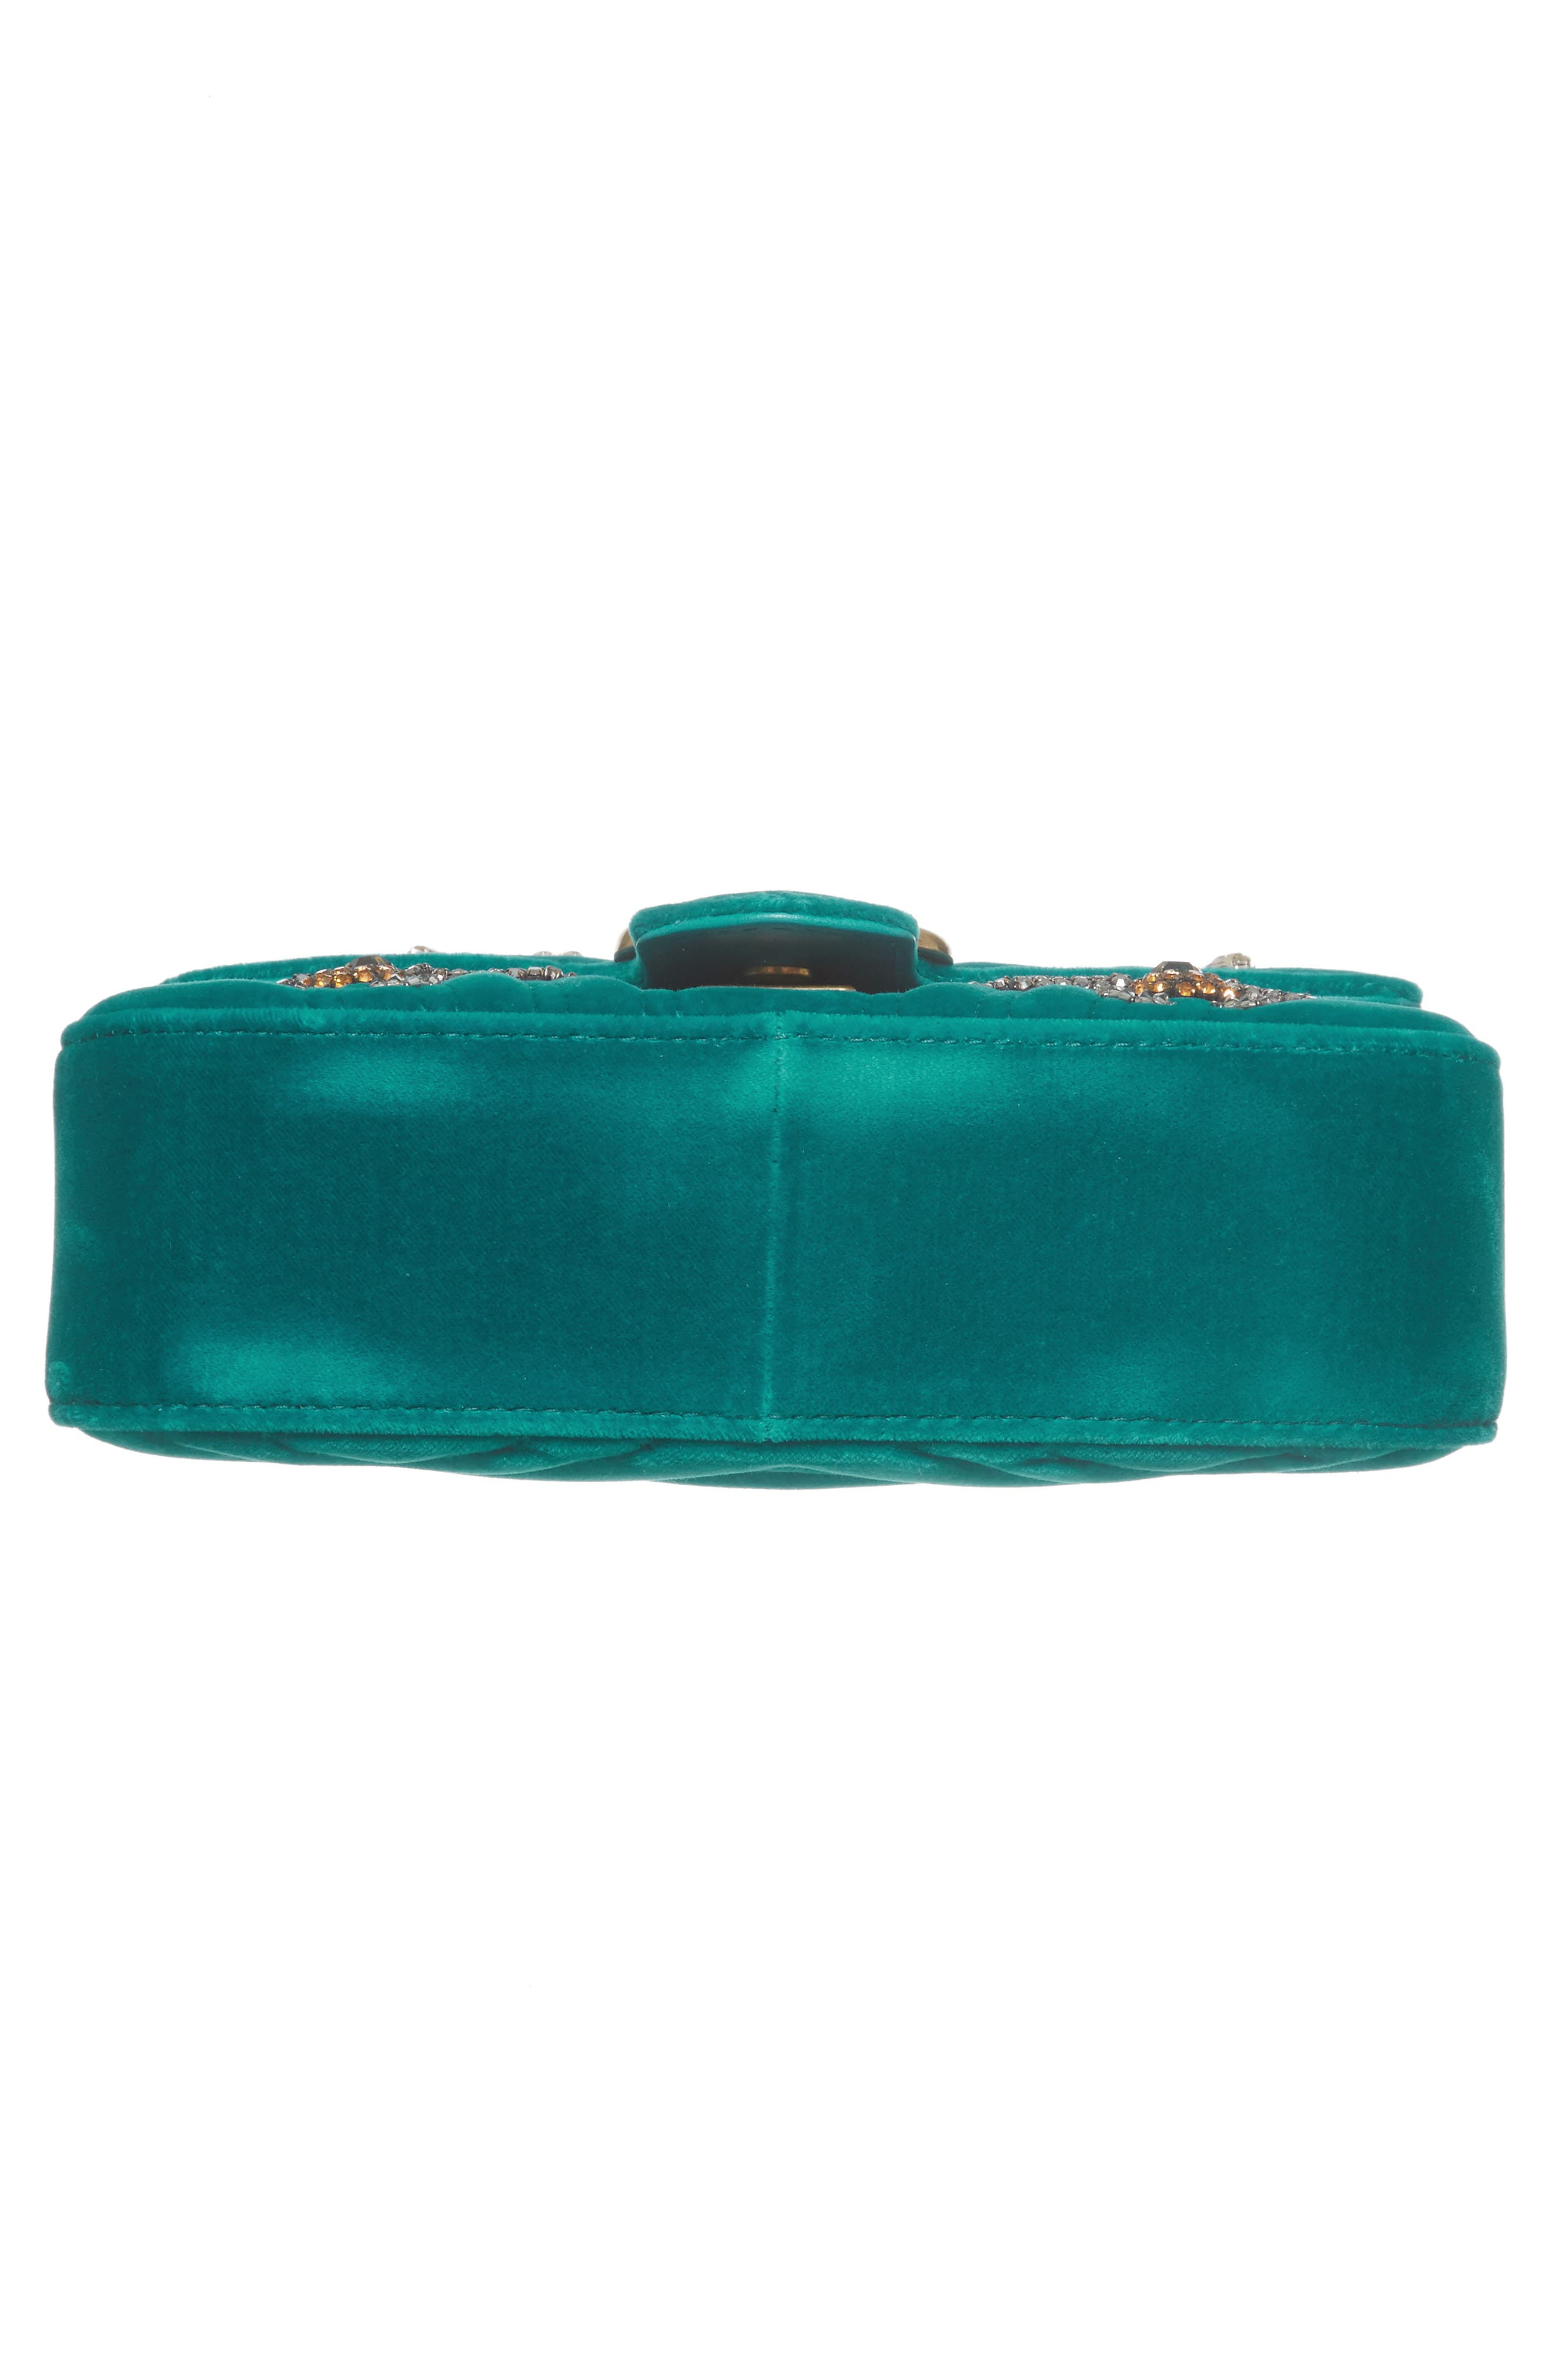 GUCCI, Mini GG Marmont Matelassé Velvet Shoulder Bag, Alternate thumbnail 6, color, PIVONE